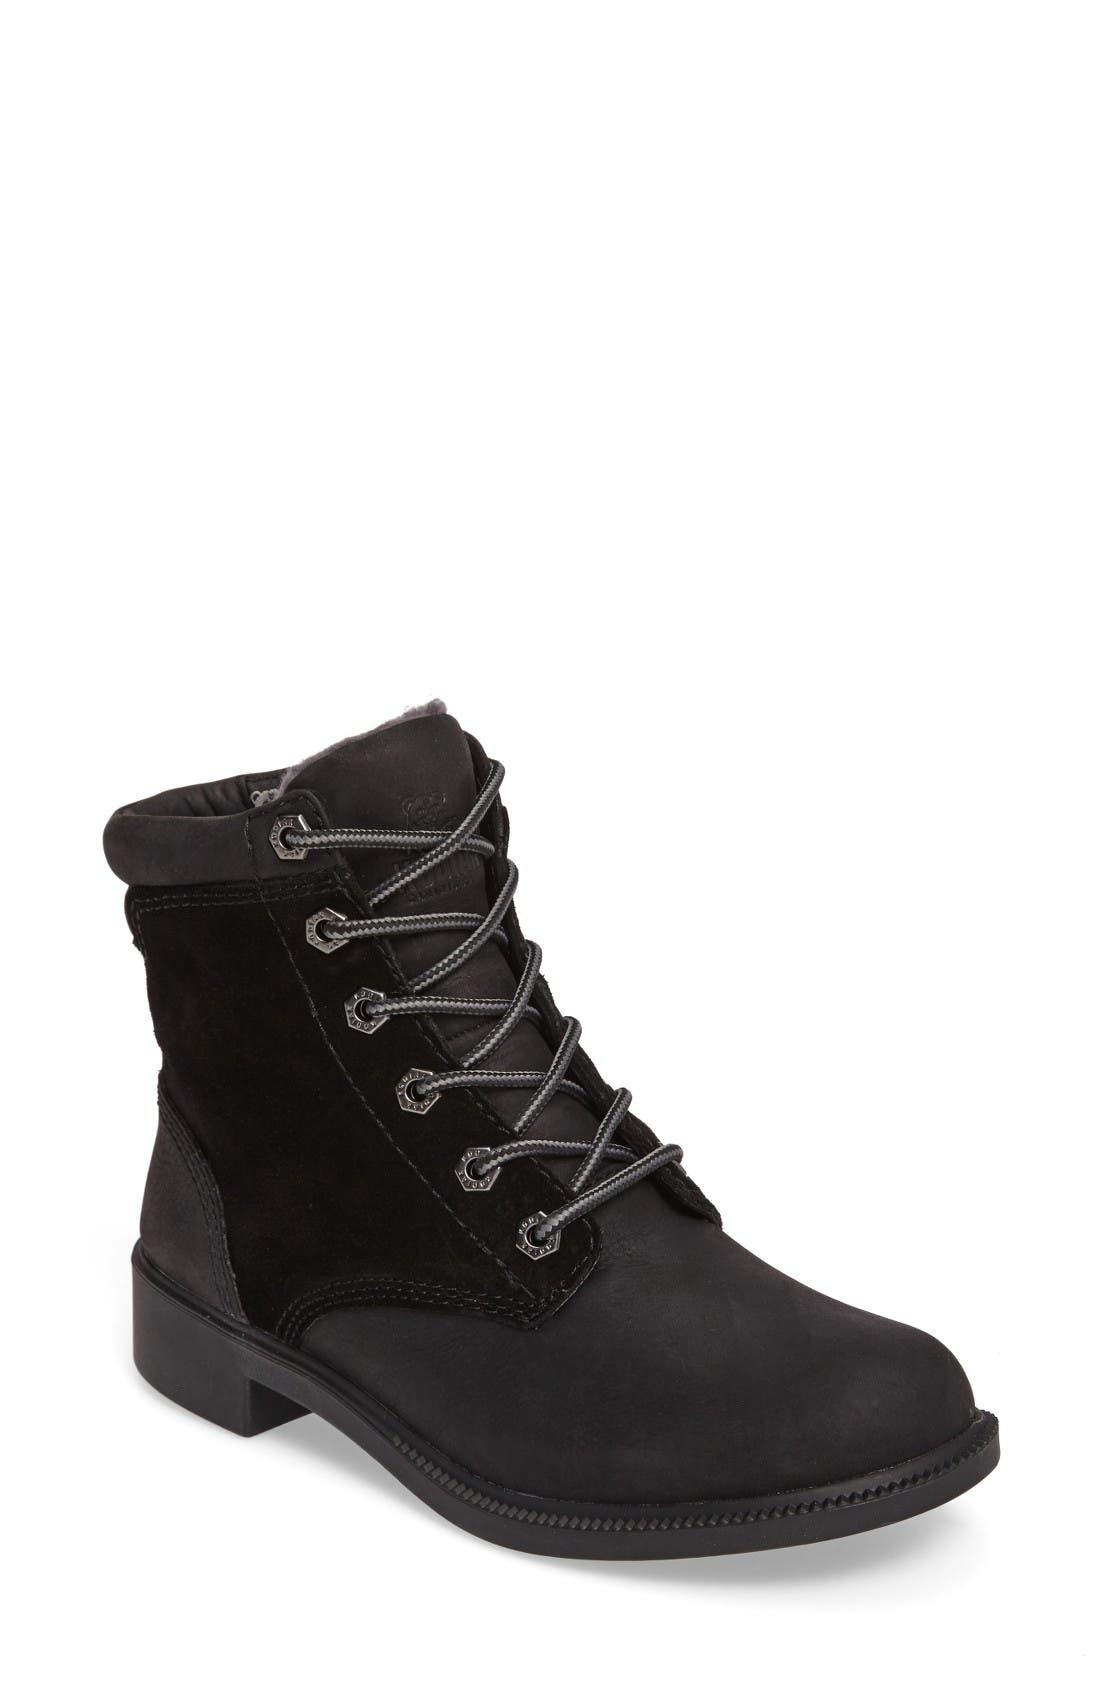 Original Waterproof Fleece Boot,                         Main,                         color, Black Leather